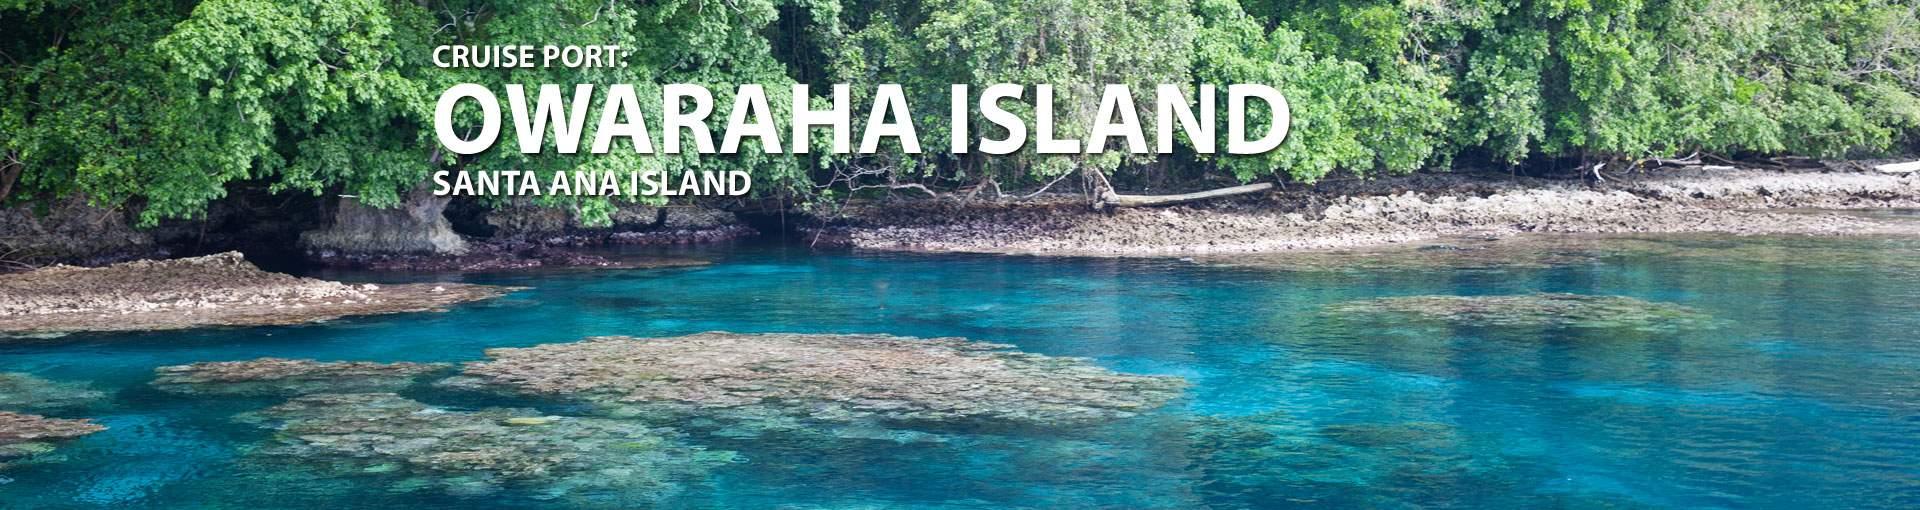 Cruises to Owaraha Island (Santa Ana Island)